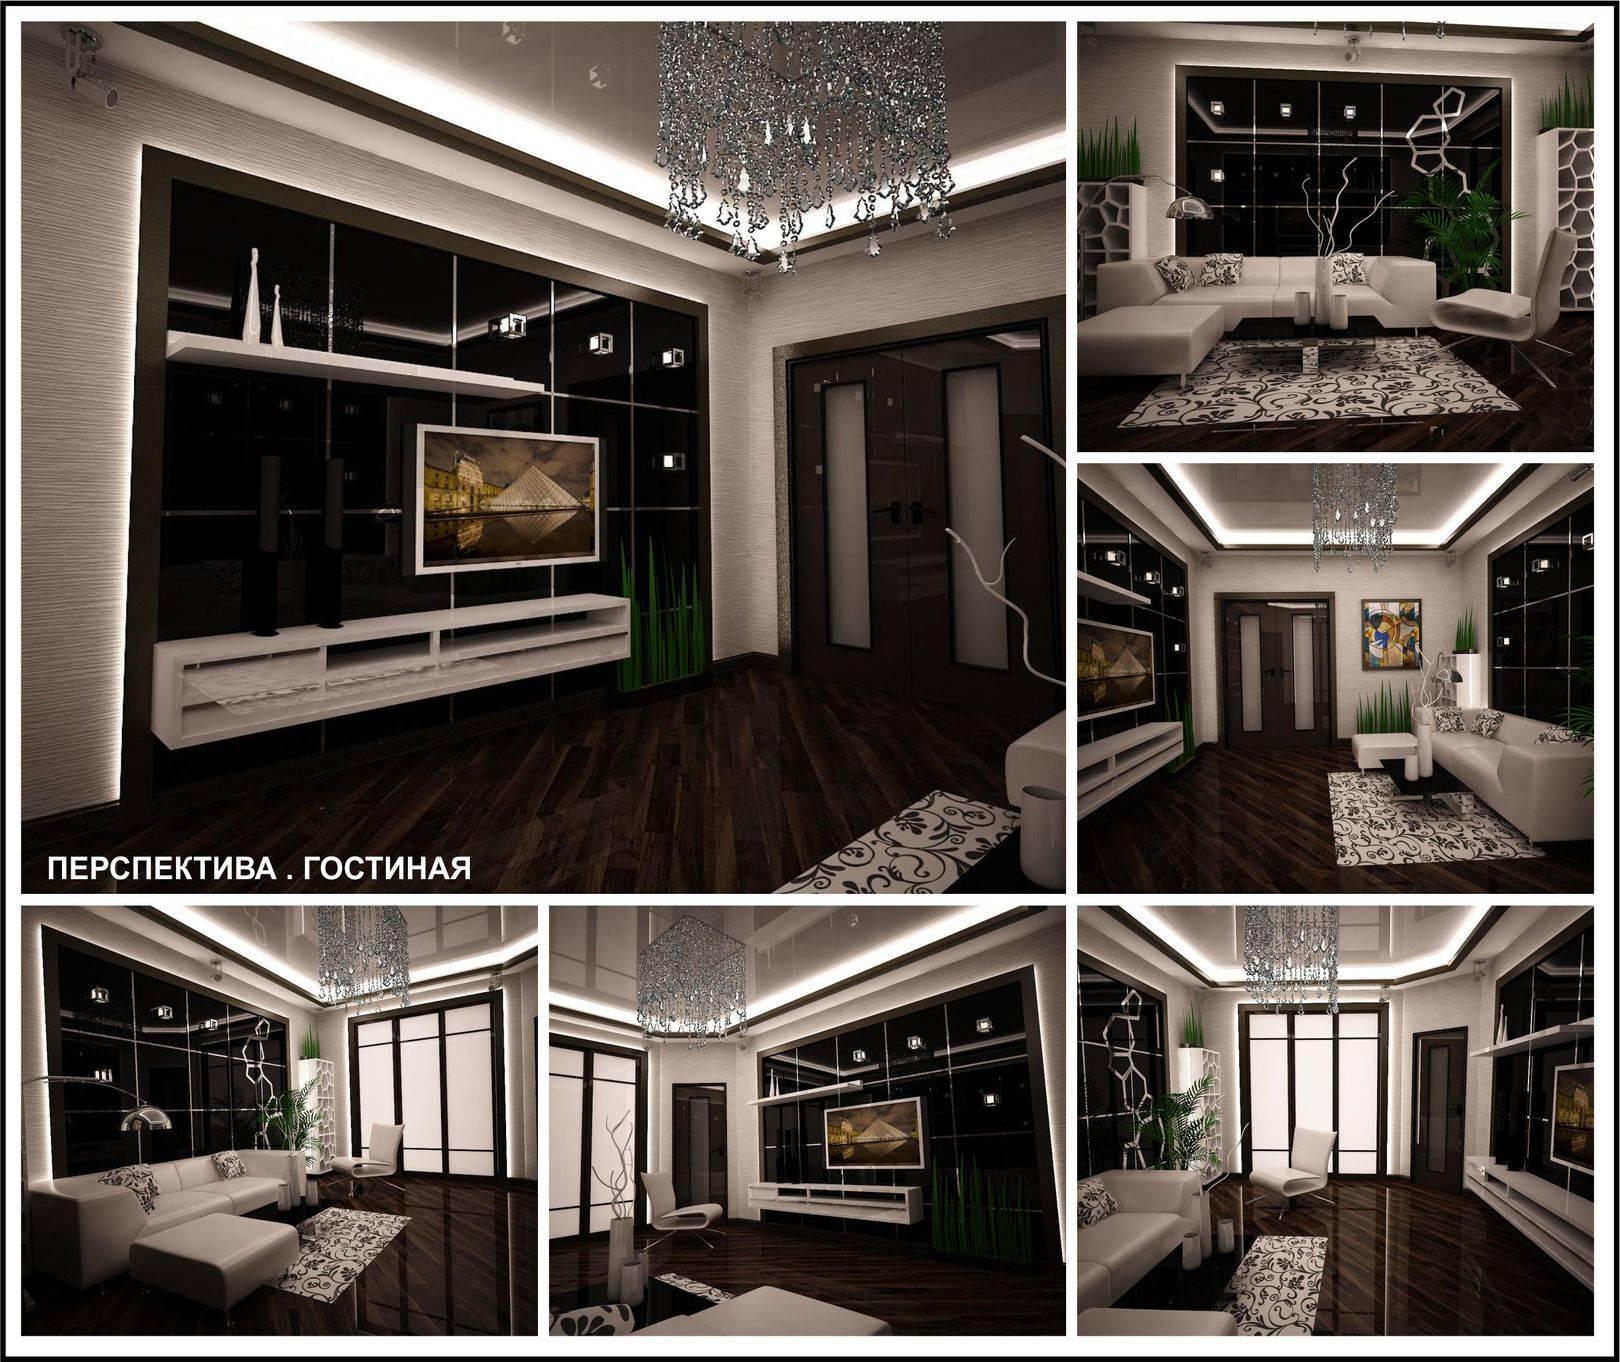 Дизайн интерьера. Холл, гостиные, лестничные маршы